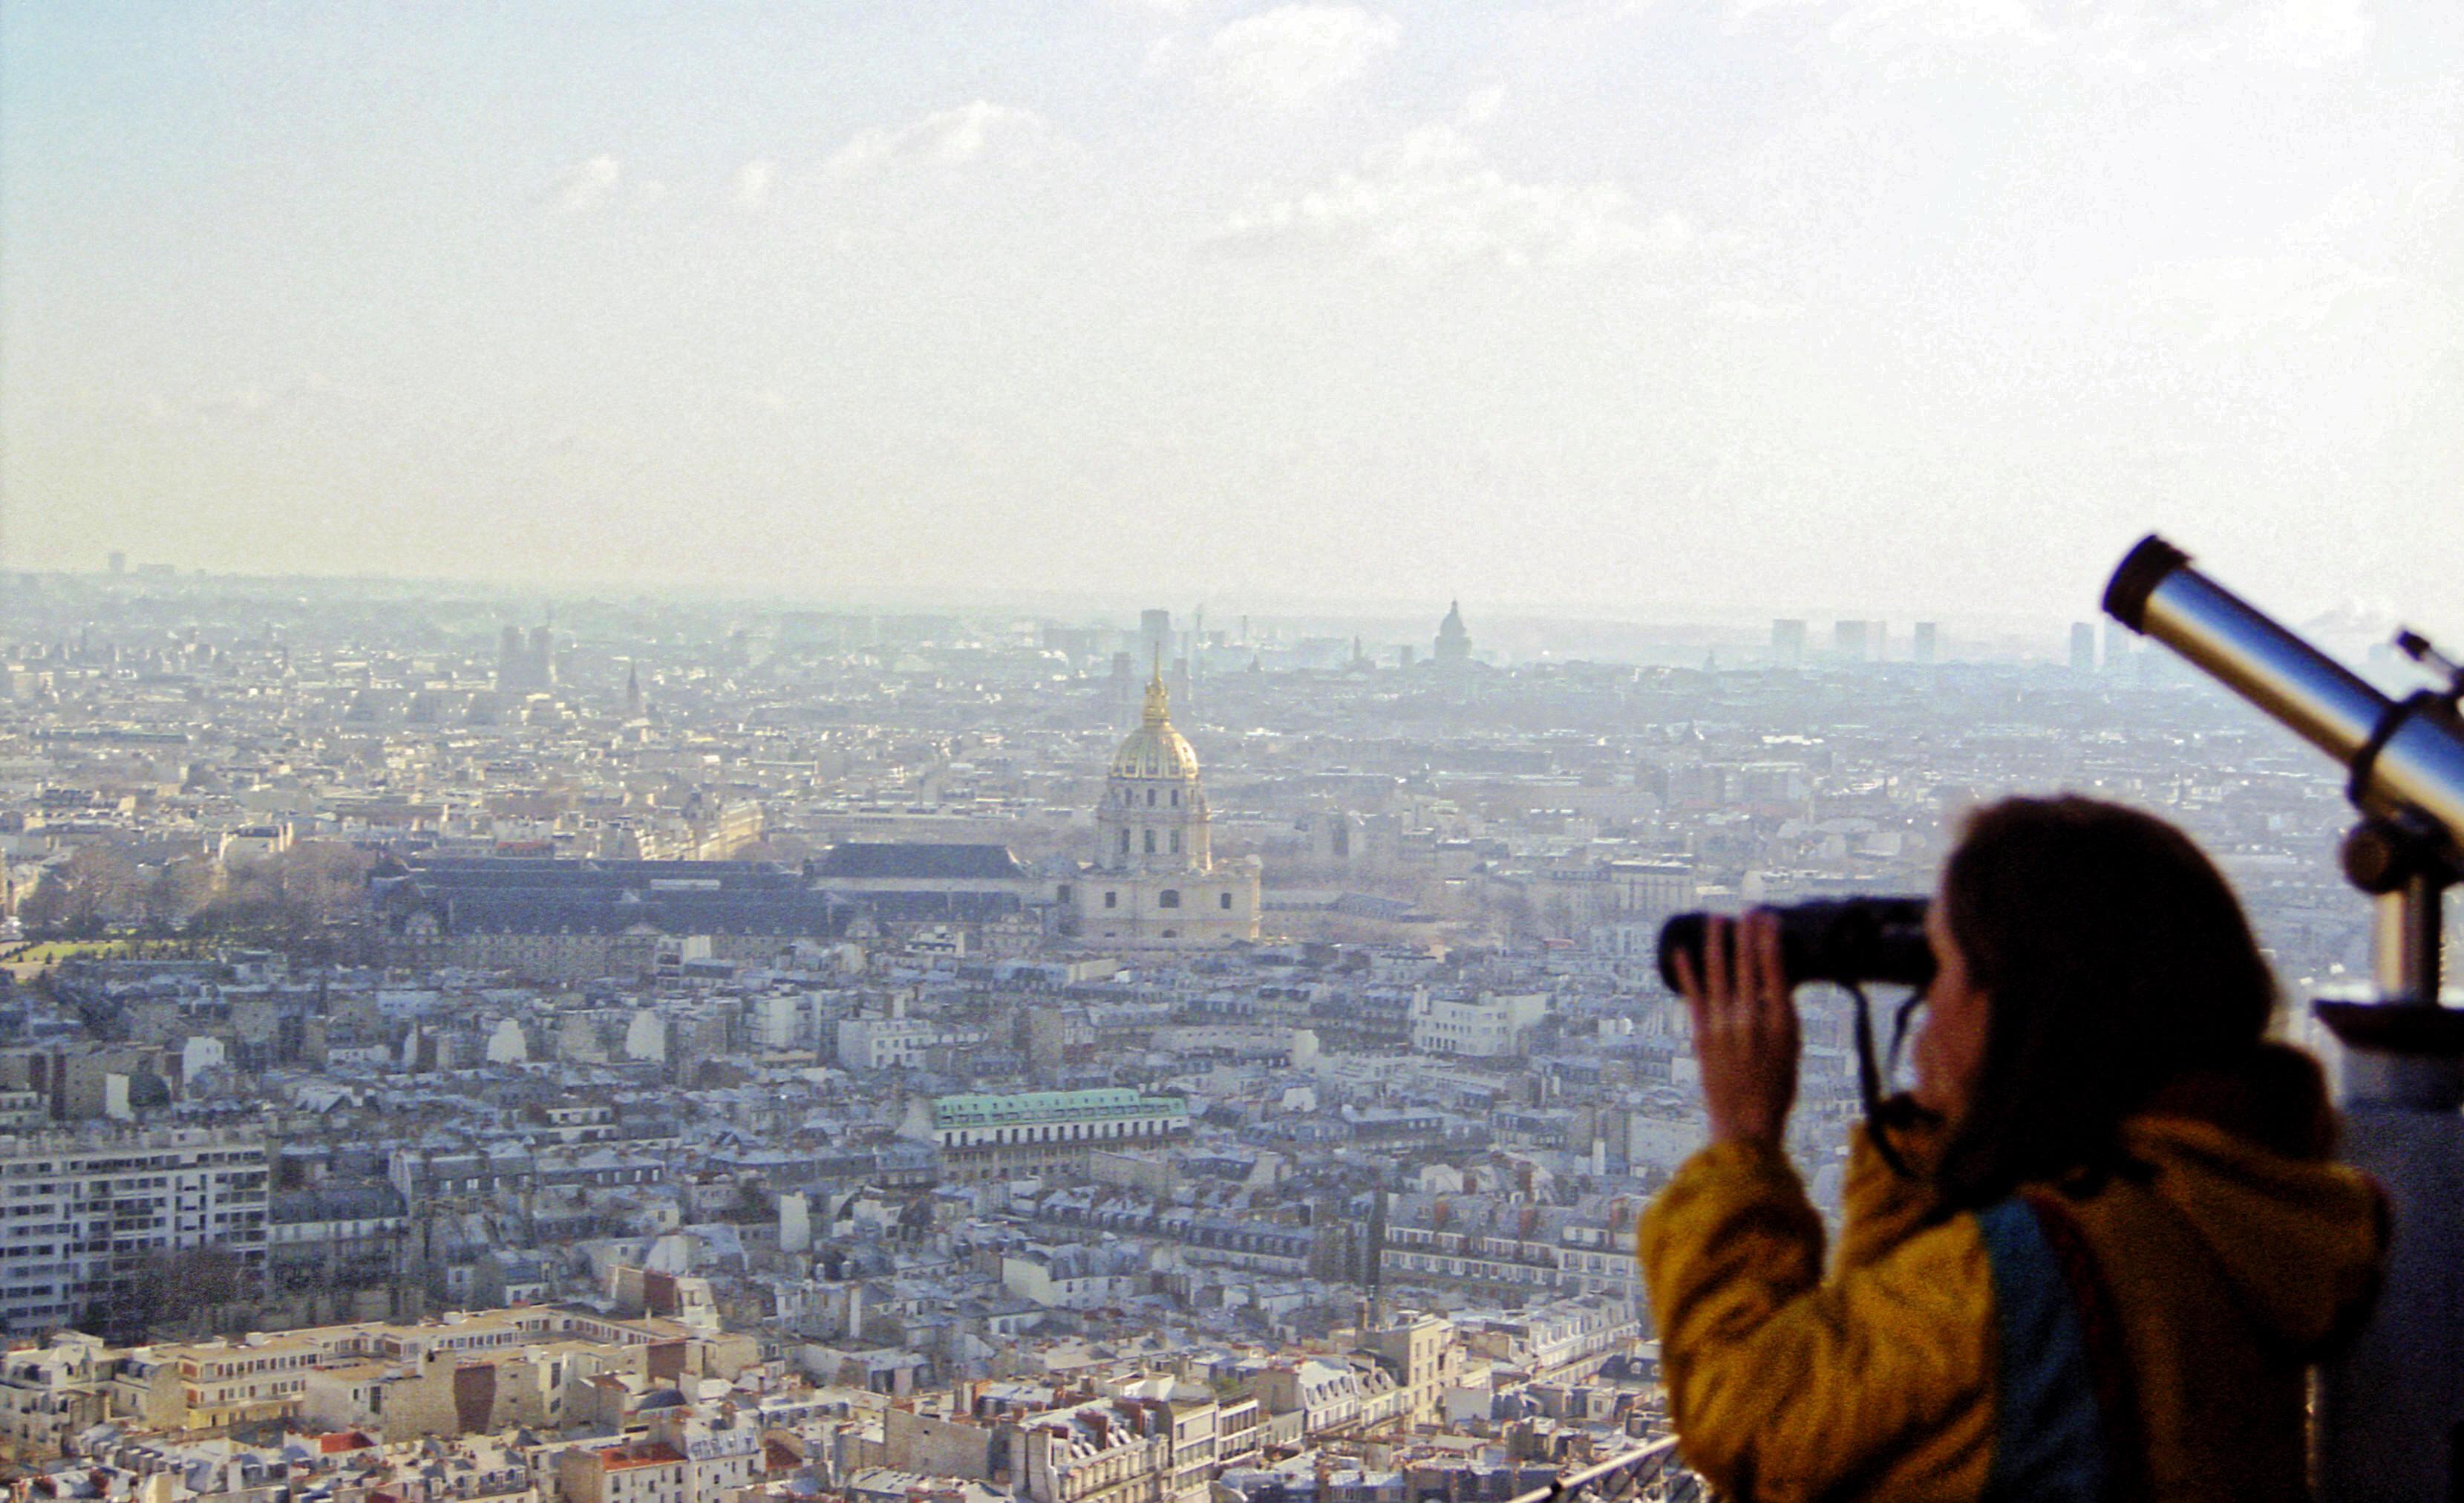 Tour-Eiffel-3.jpeg